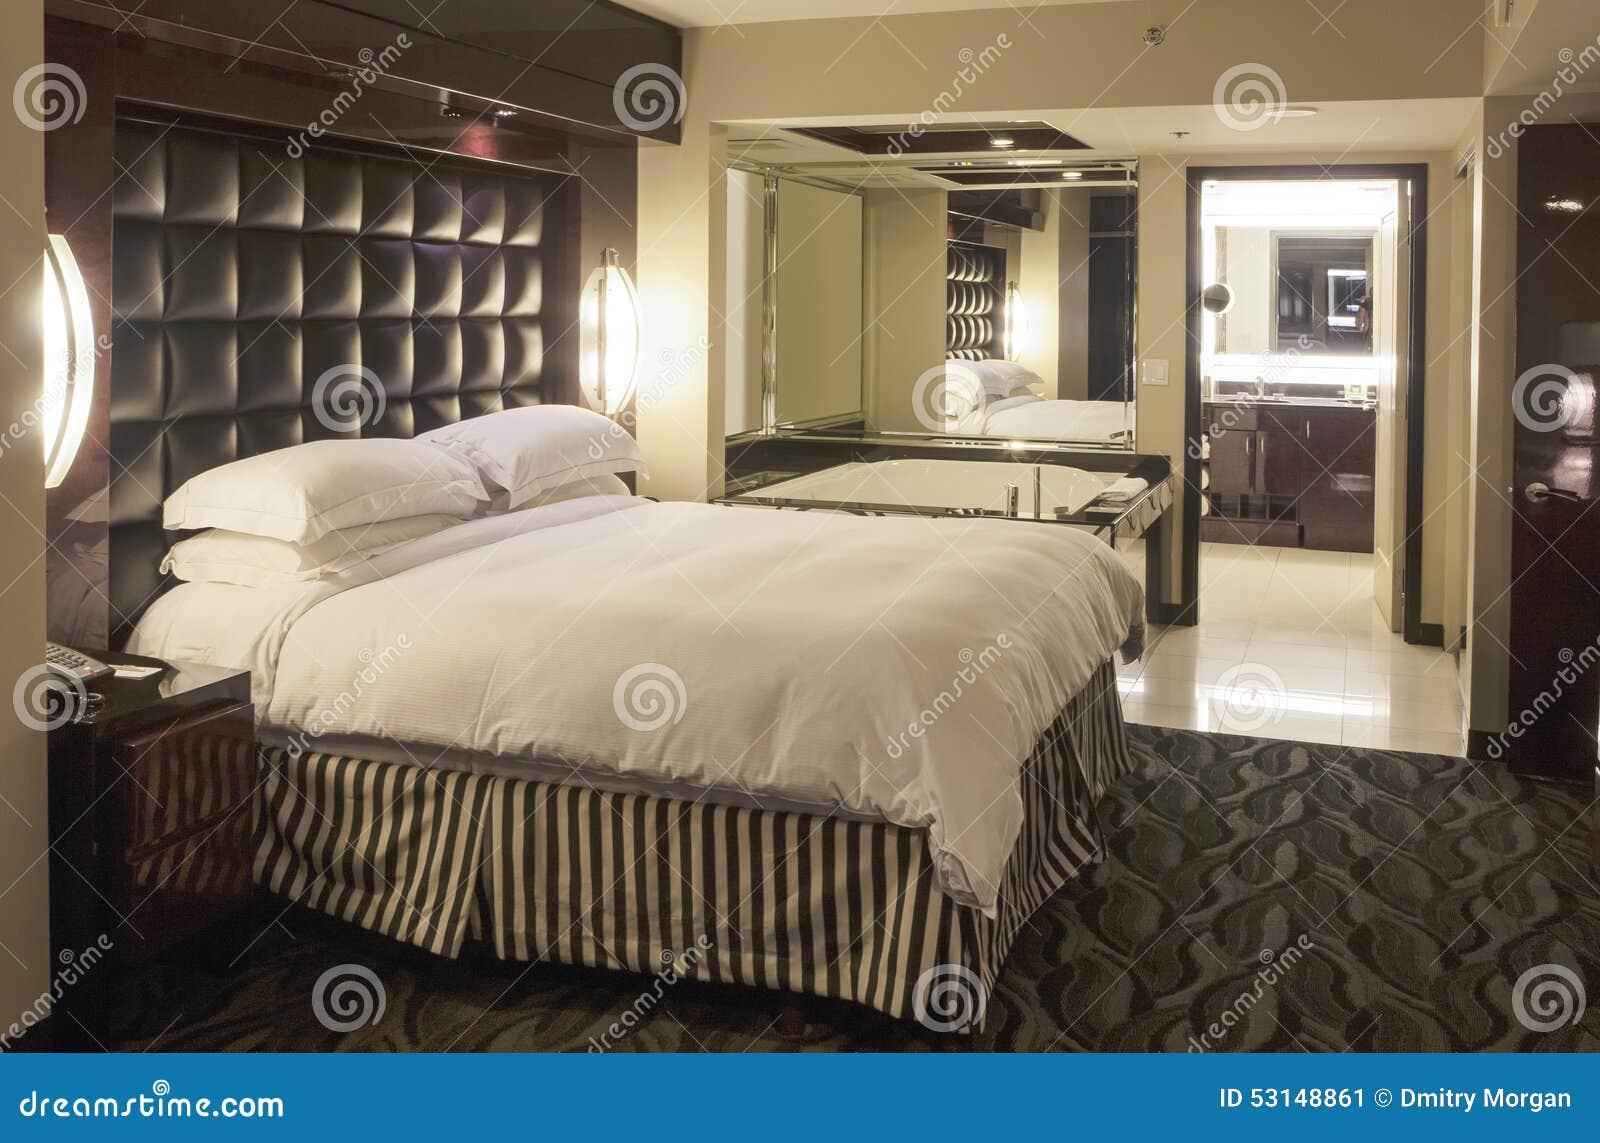 Indogate.com  Salle De Bain Chambre D Hotel